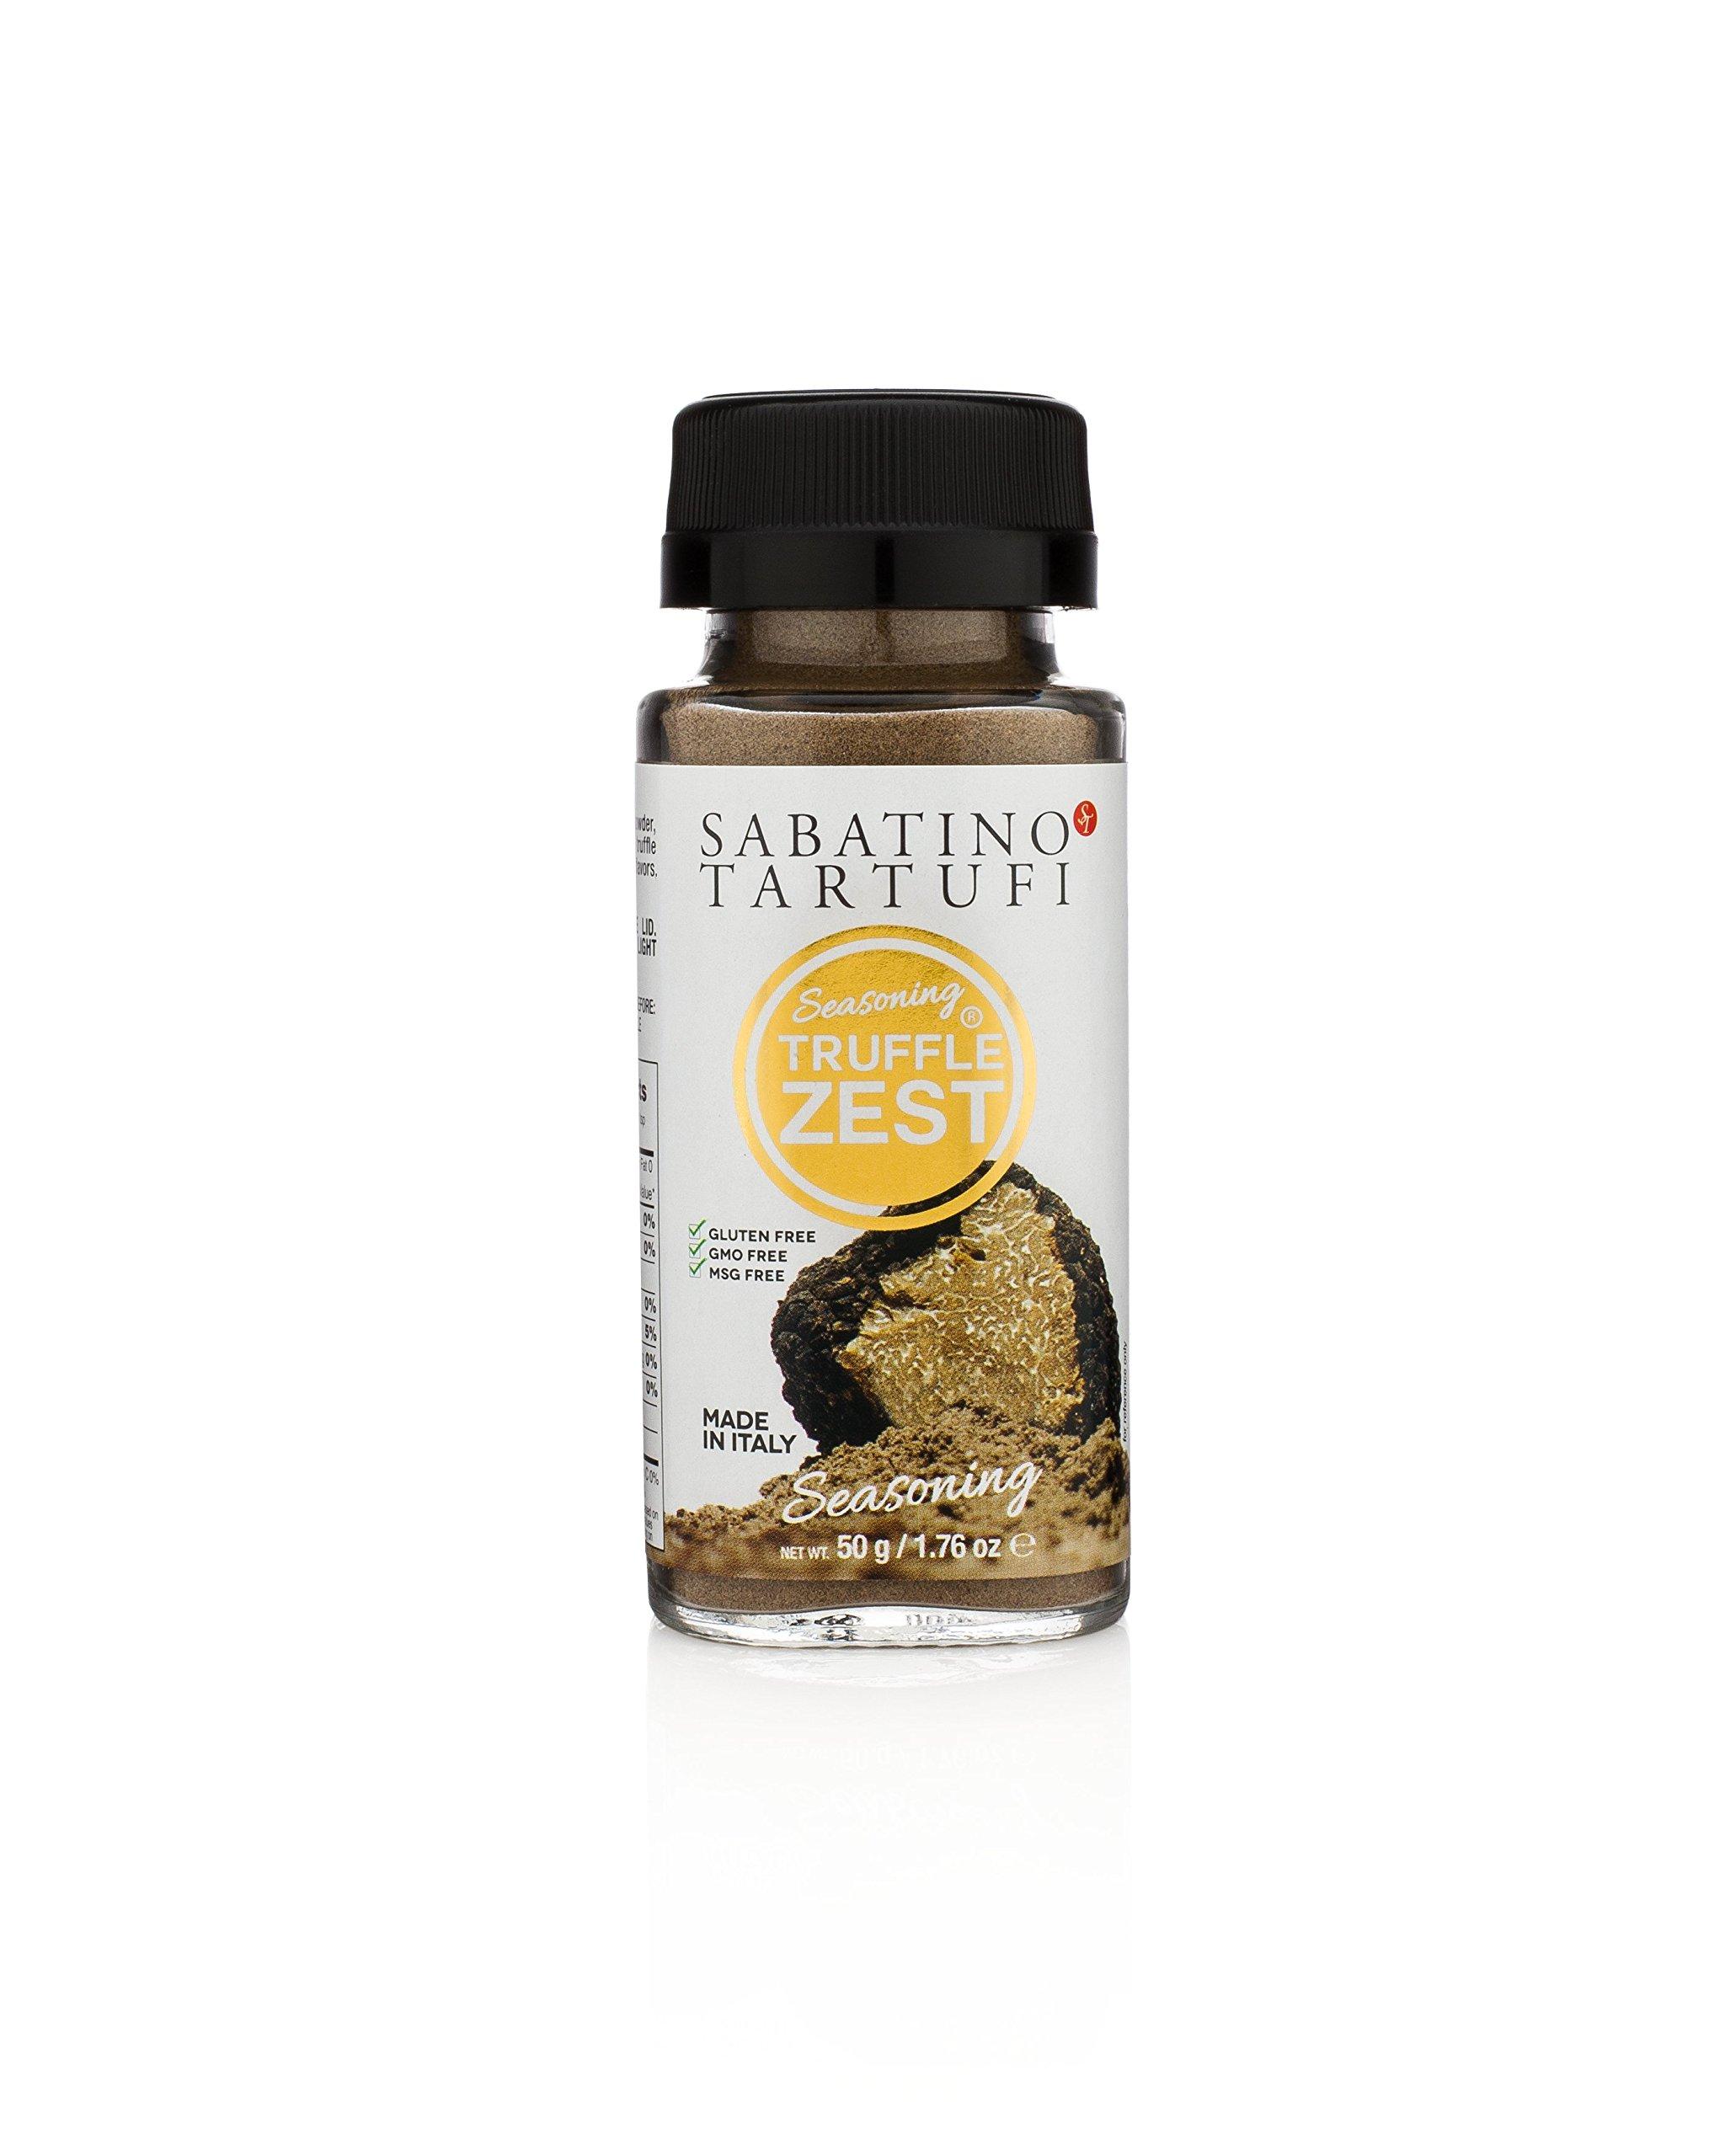 Sabatino Tartufi Truffle Zest Seasoning, 1.76 Ounce